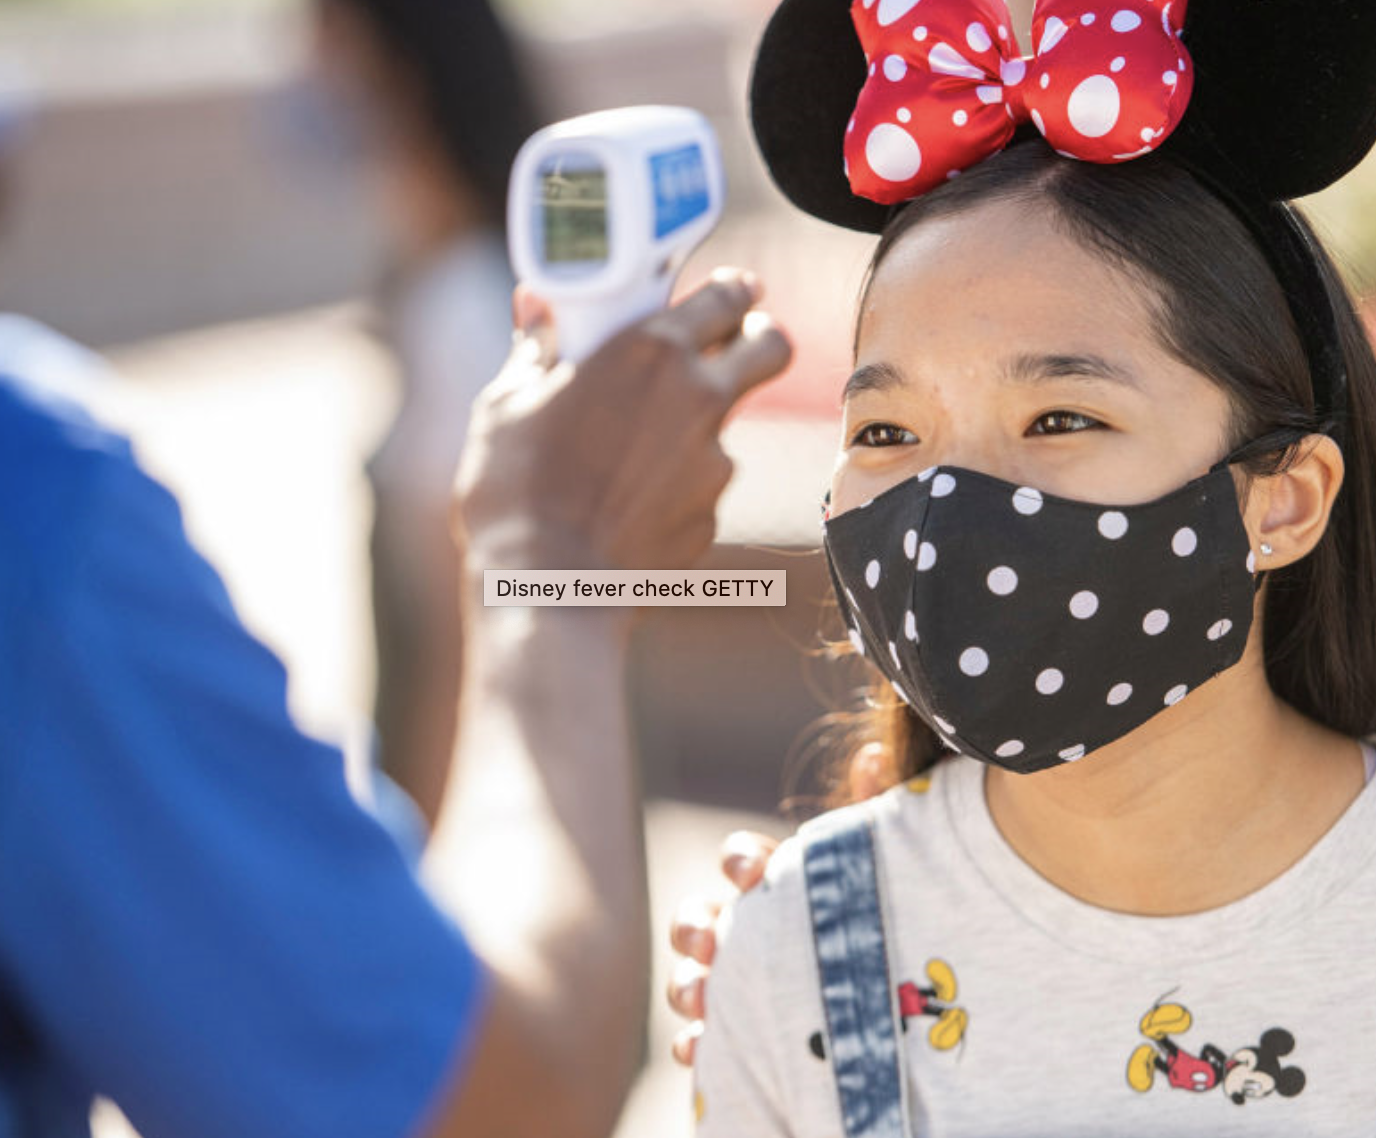 A child is checked for fever at Walt Disney World. Credit: David Roark/Walt Disney World Resort/Getty Images